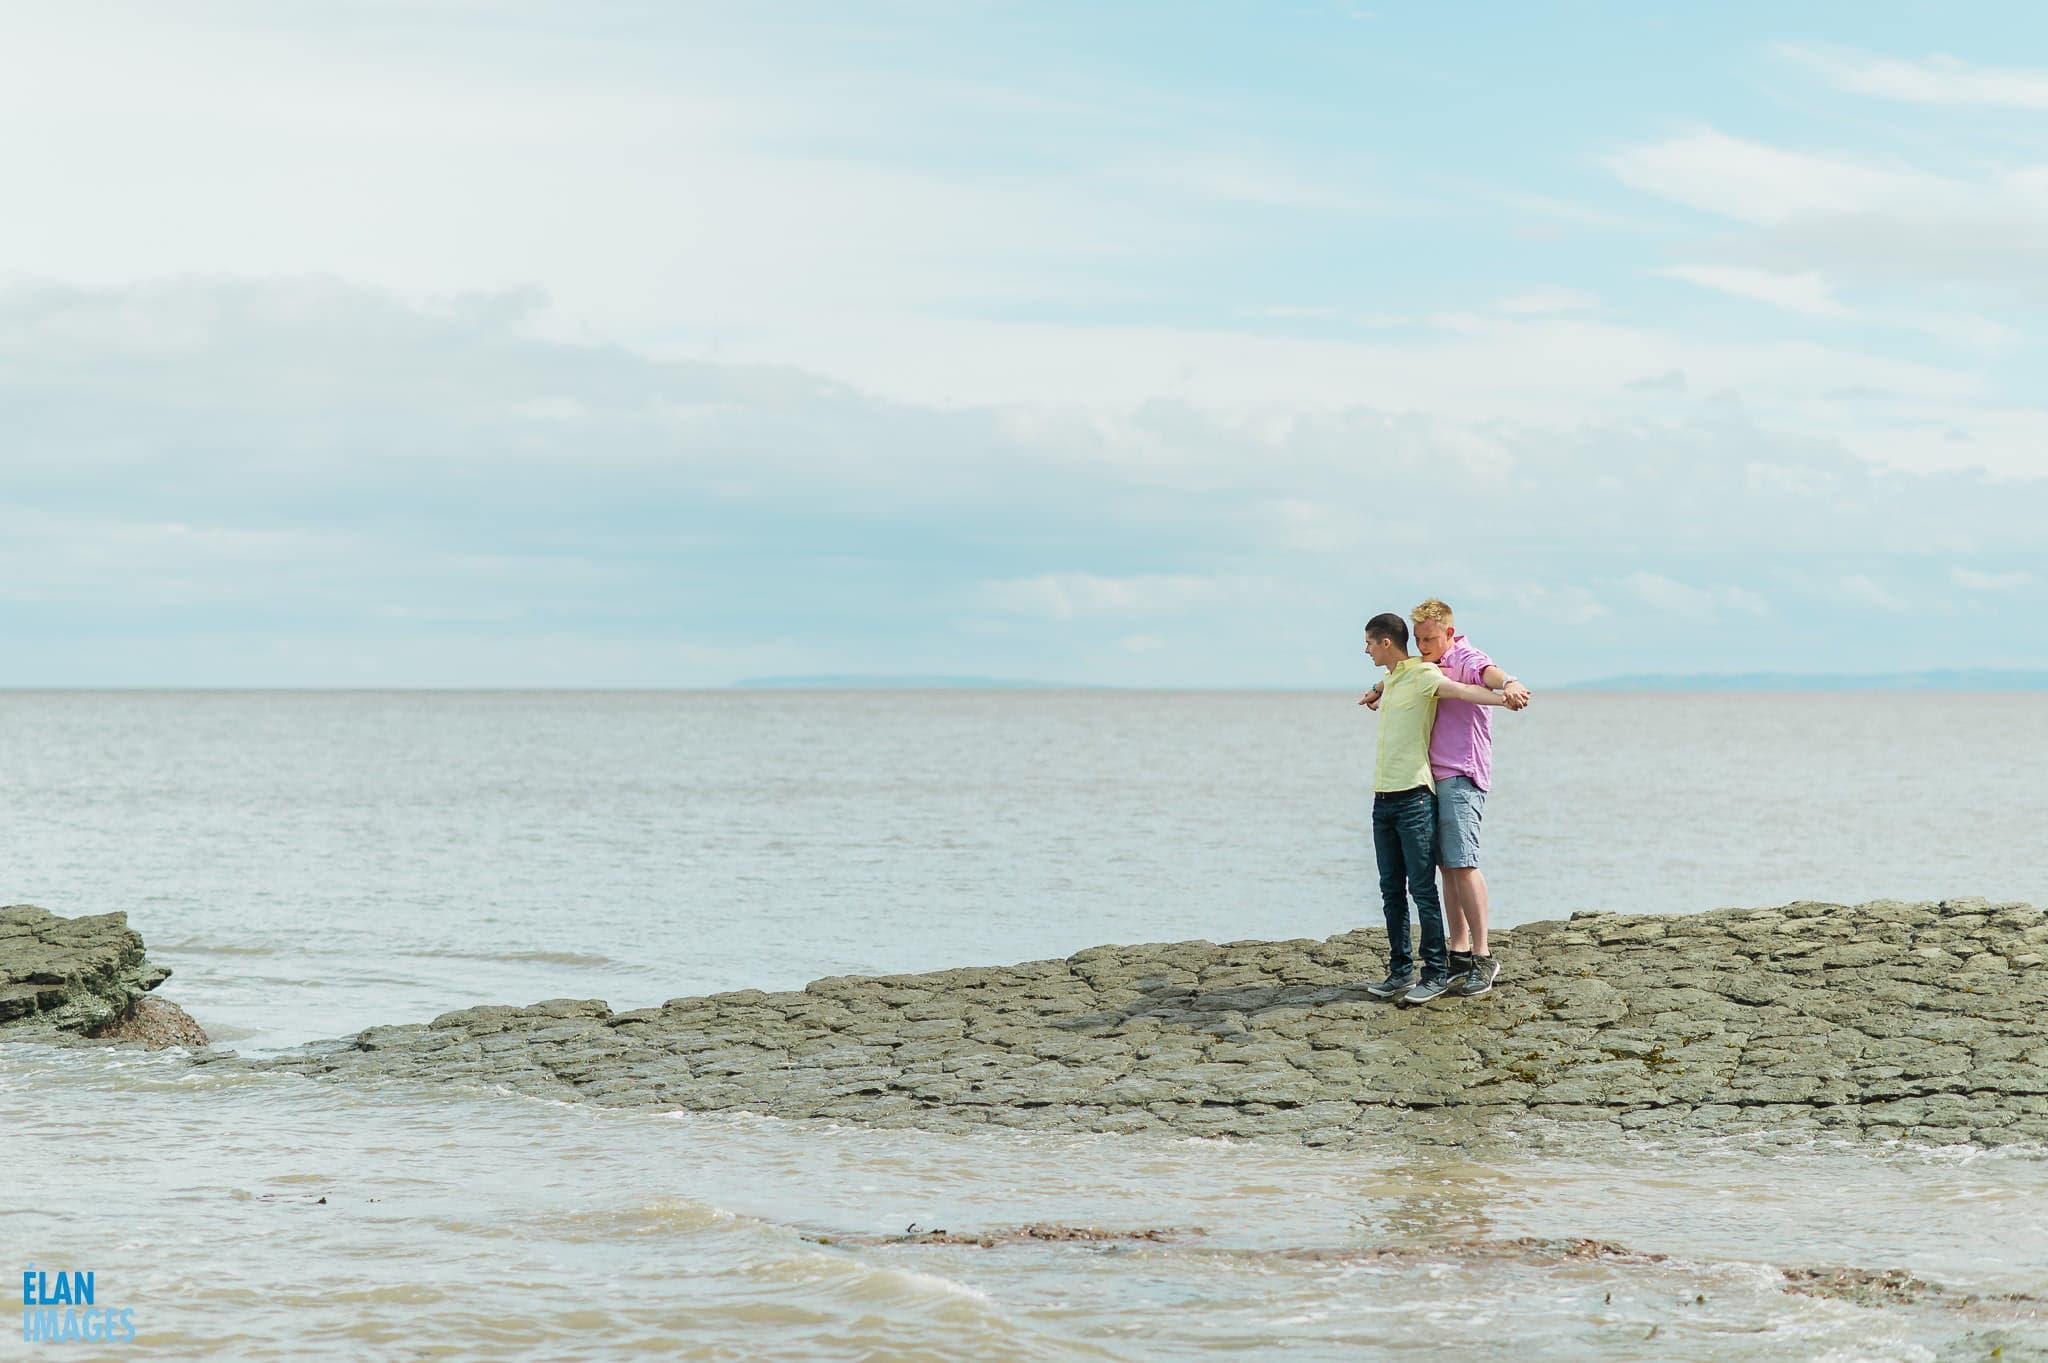 Engagement photo shoot at St Audrie's Bay, Devon 2